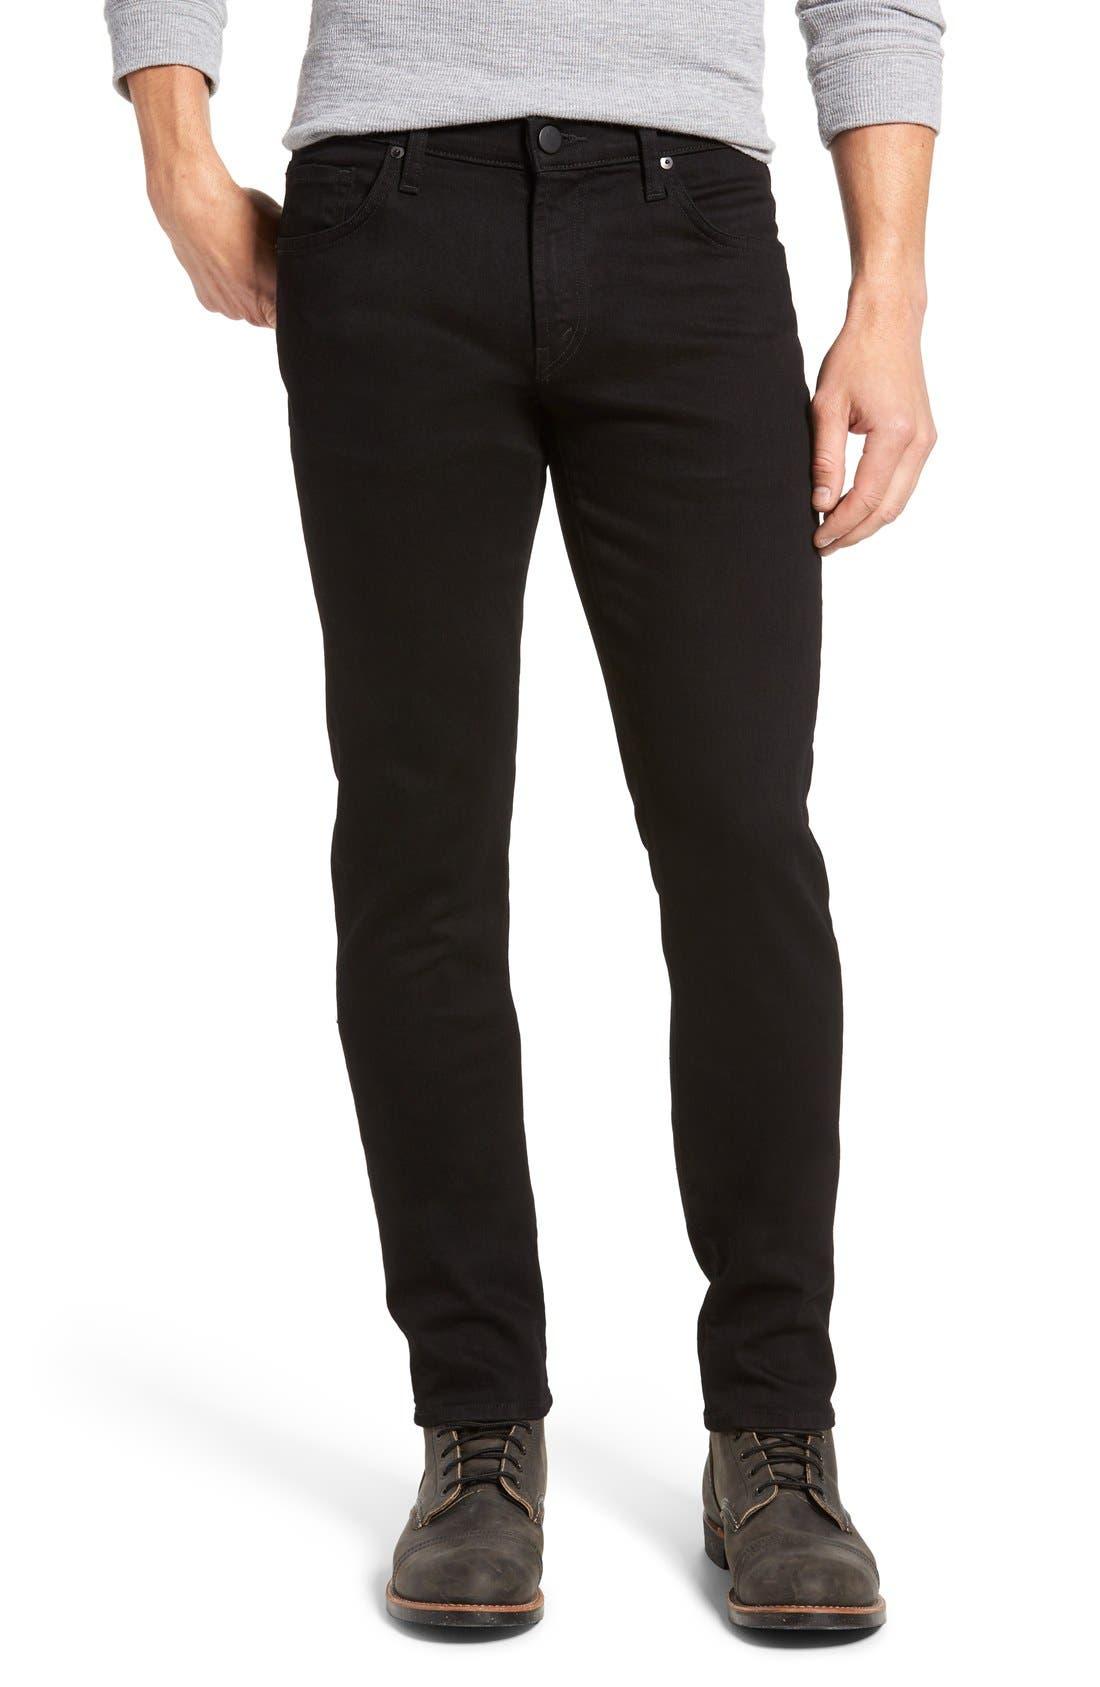 J BRAND, Tyler Slim Fit Jeans, Main thumbnail 1, color, TRIVOR BLACK